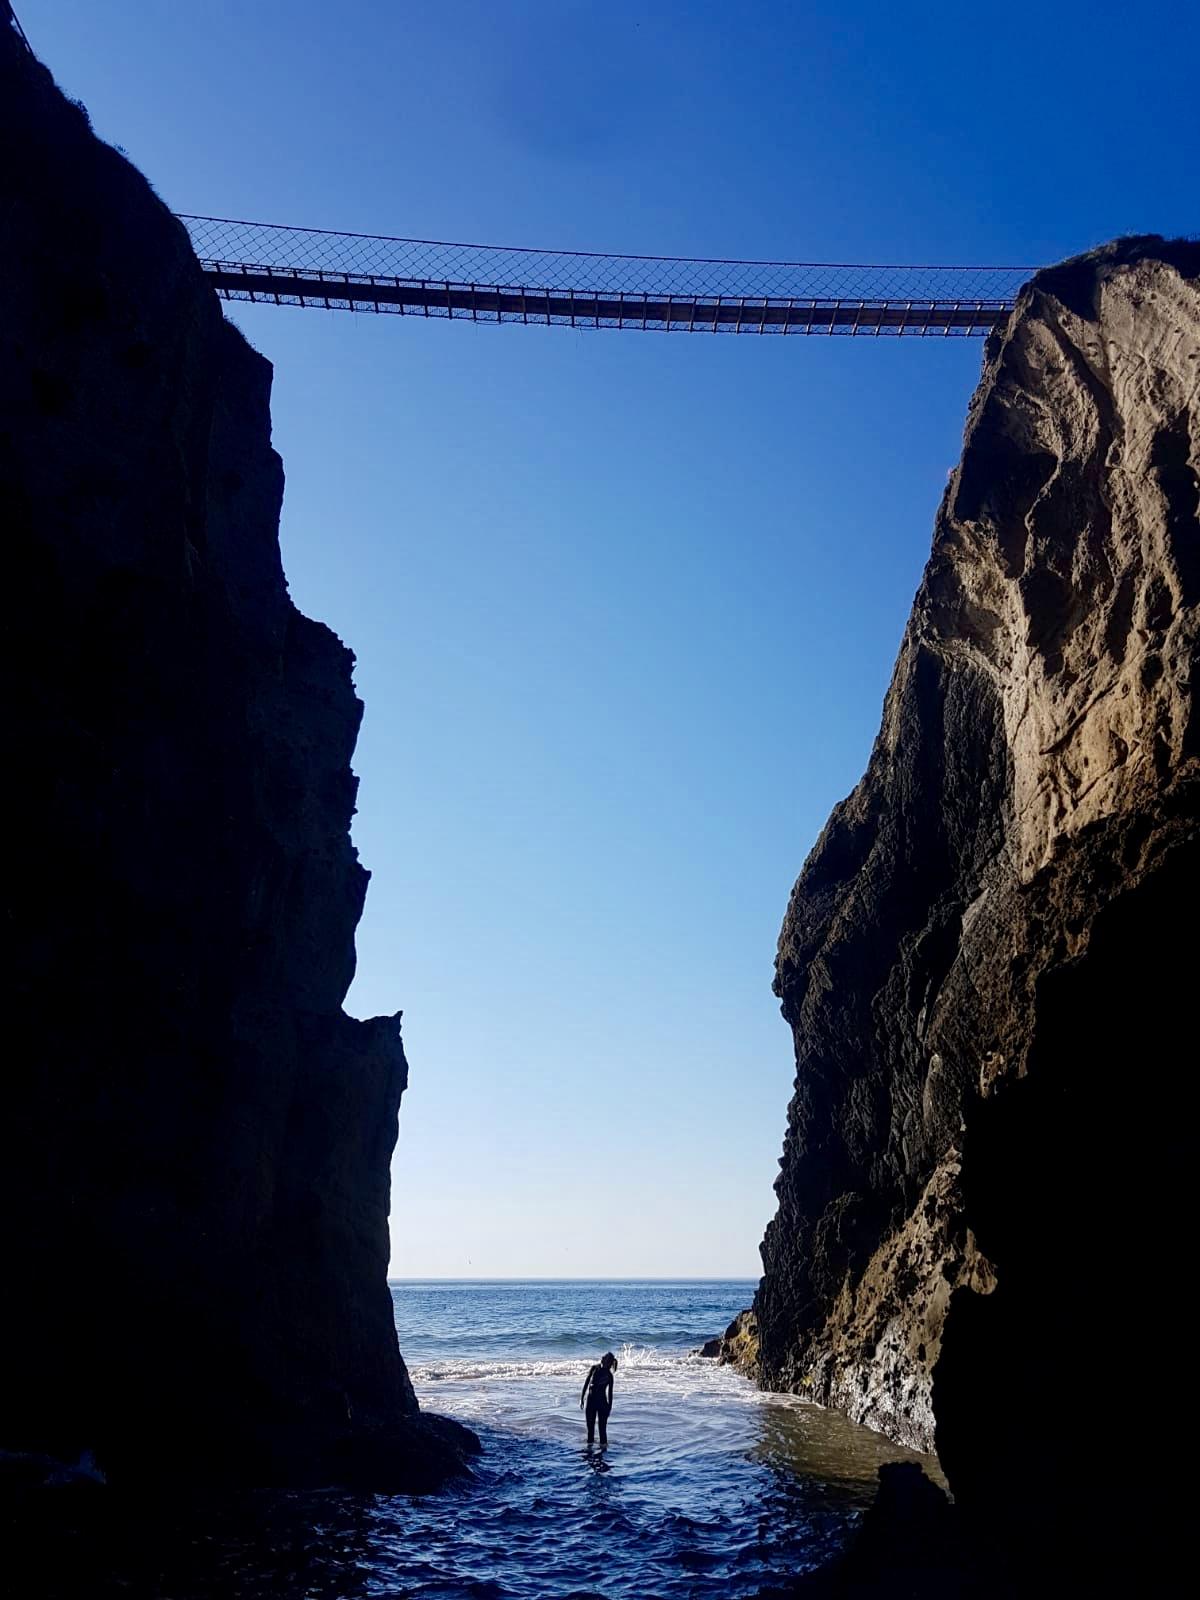 carrick-a-rede-rope-bridge-sup-paddle-board-causeway-coast (7).jpeg